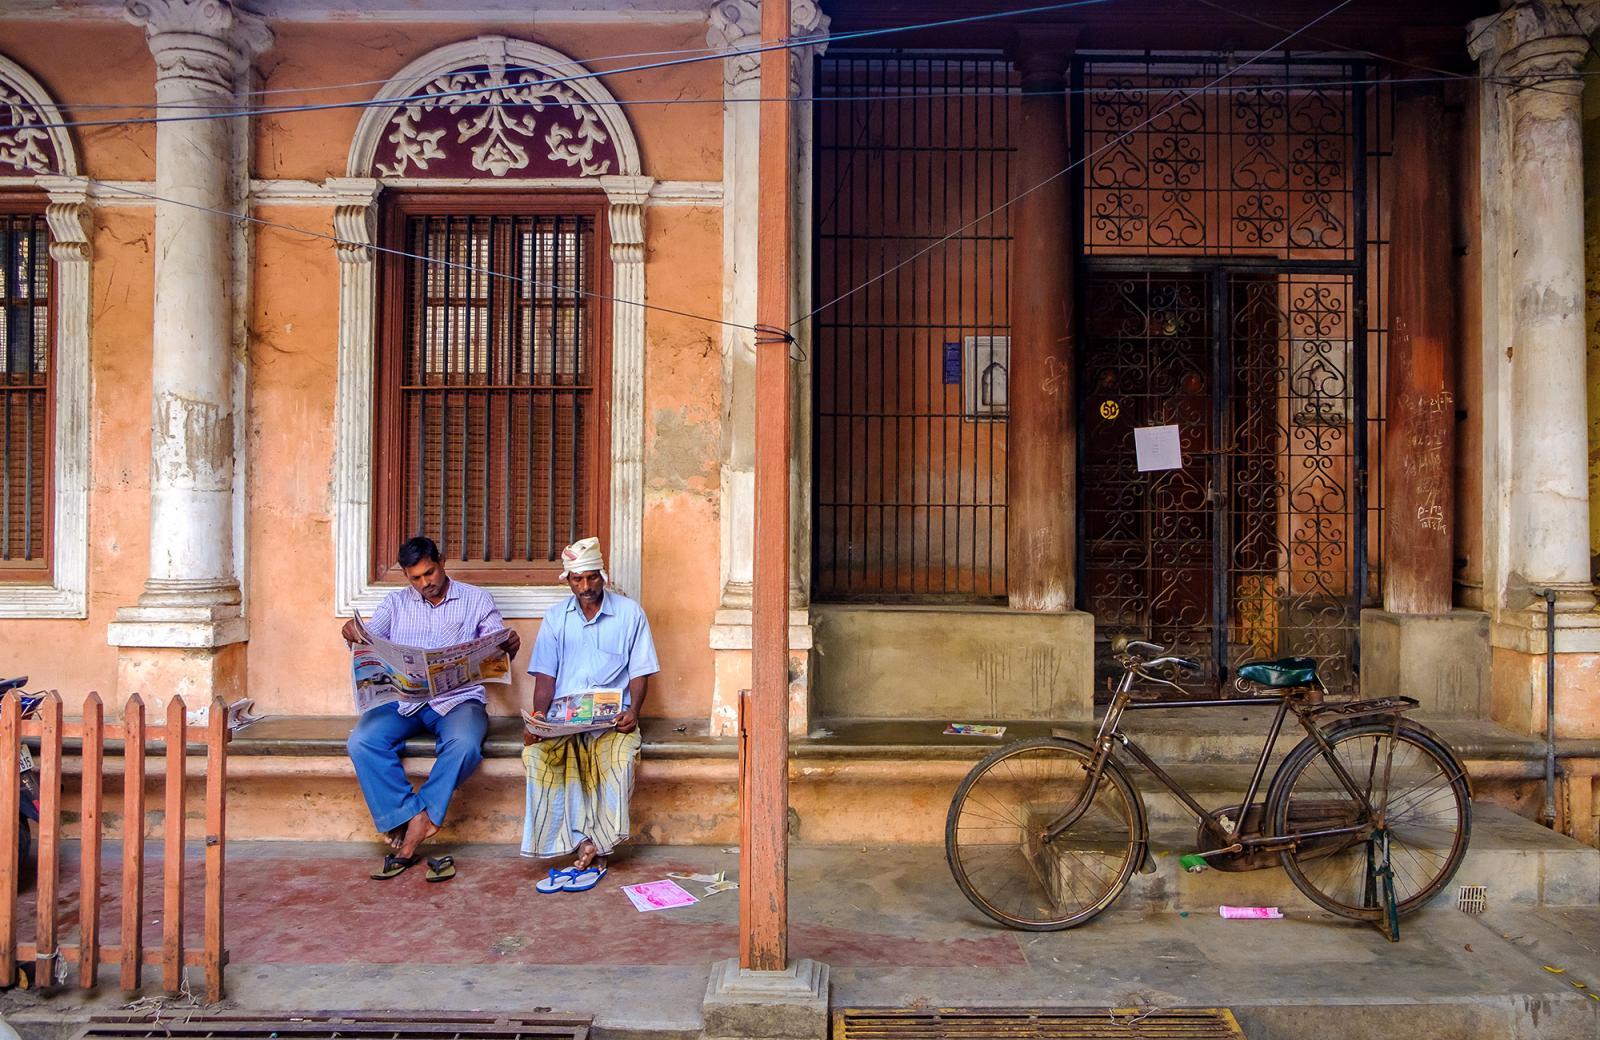 Photography image - Loading Tamil_Architecural_works__Thinnai_pondicherry__culture_tamil__Tamilnadu__Tamils_home._Vintage_design___mouhamed_moustapha__colours__thinnai18.jpg